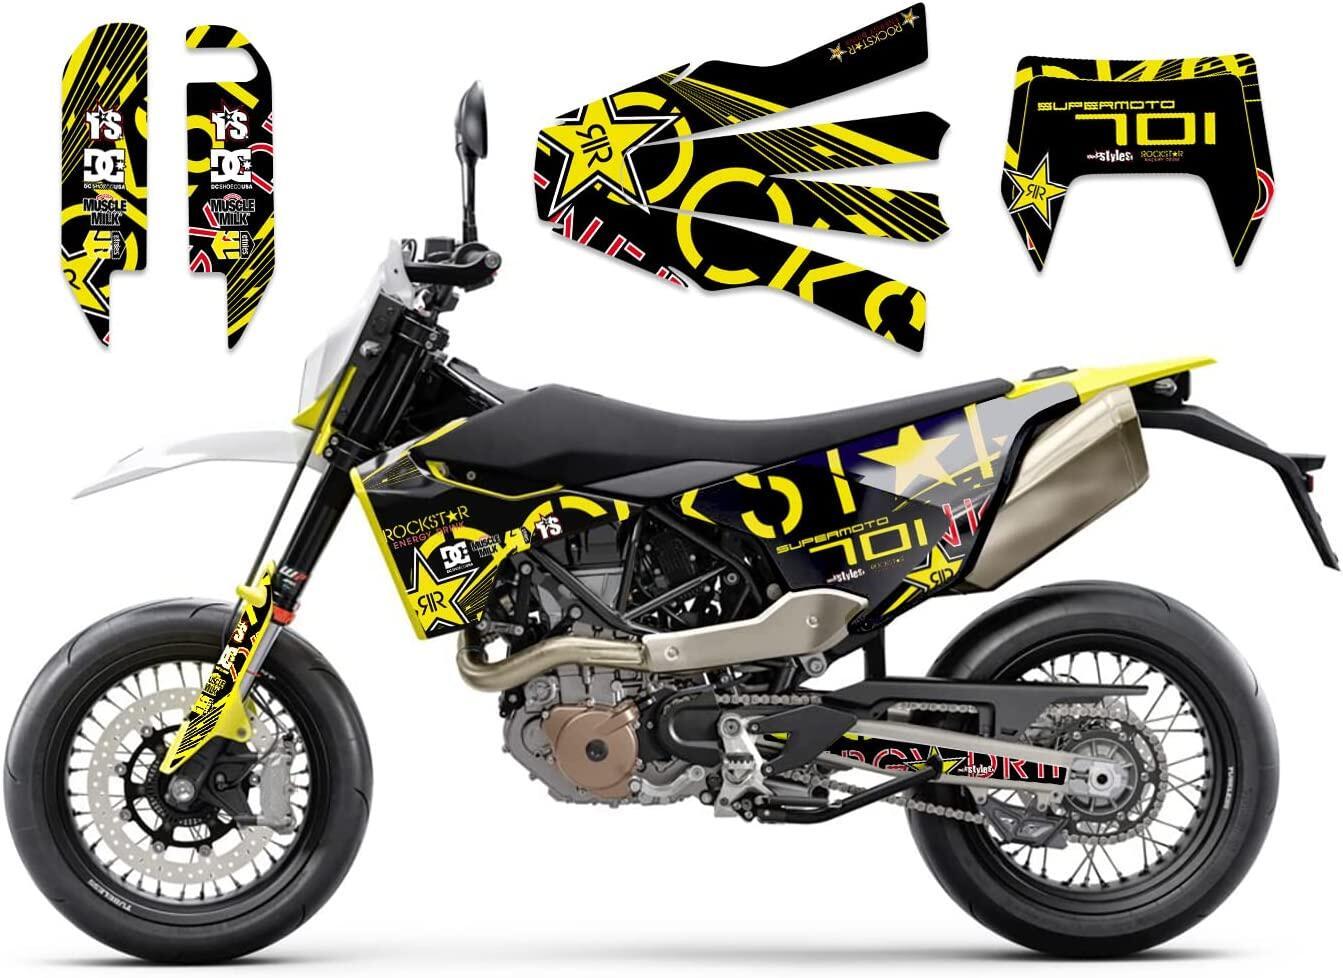 Brandings Basic Dekor-Kit für HUSQVARNA 701 Supermoto / ENDURO (2016-2020) bestehend aus Gabel li./re., Kotfl